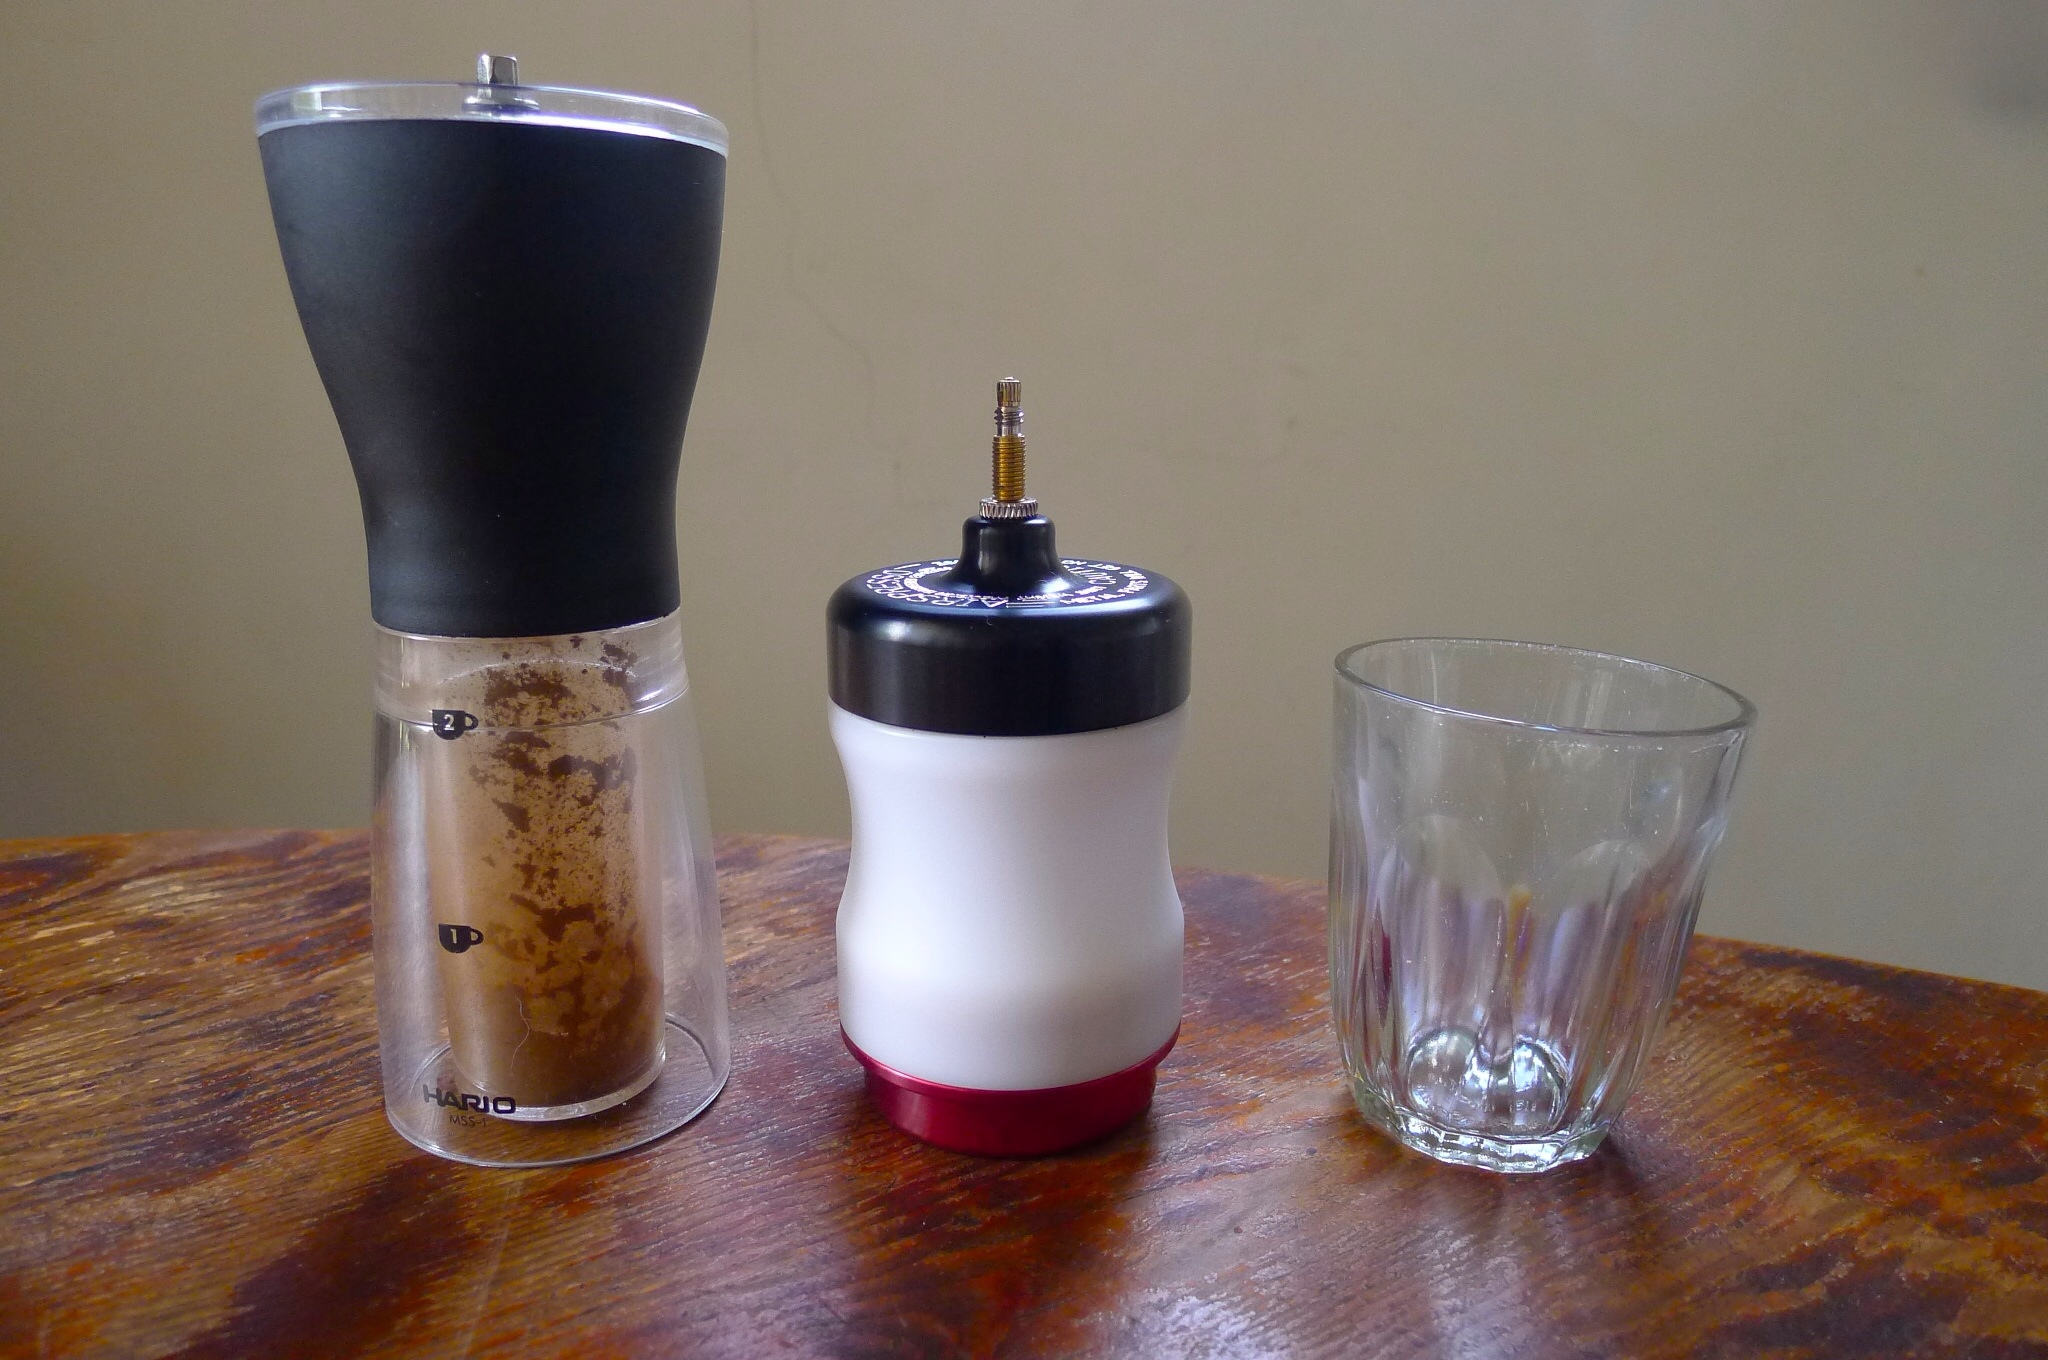 airspresso